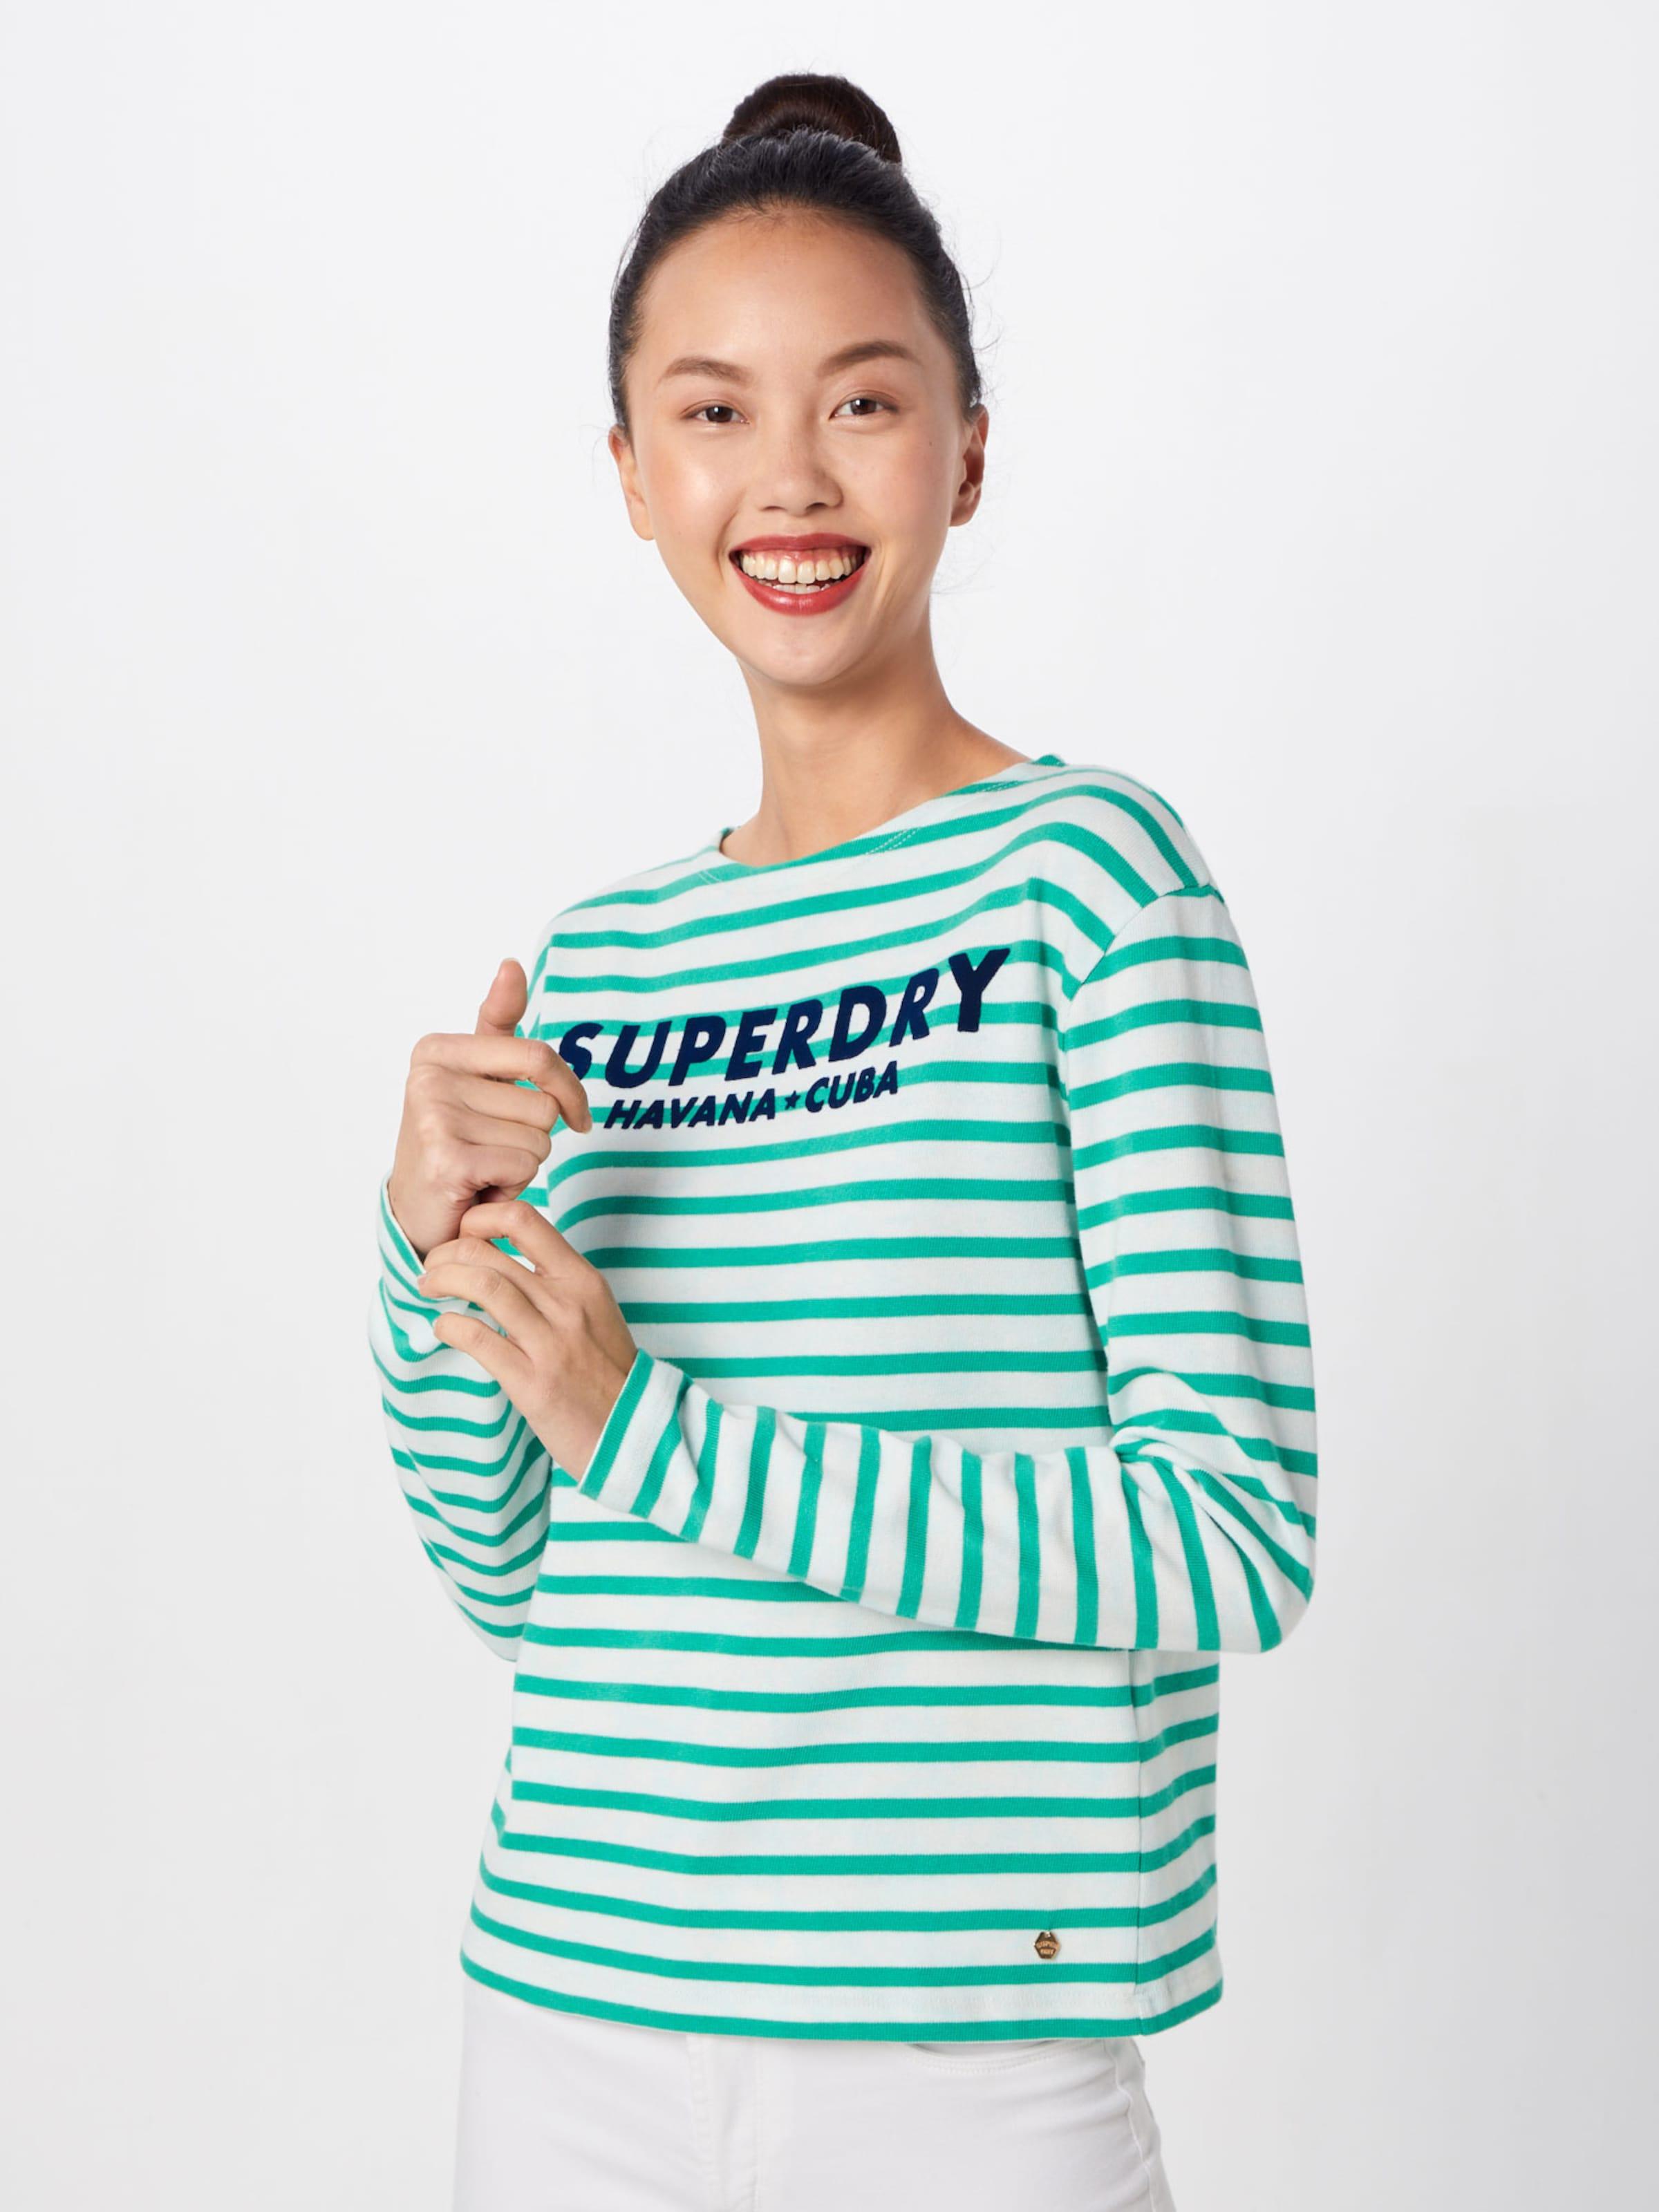 In 'havana' 'havana' Superdry Shirt GrünWeiß 'havana' In Superdry GrünWeiß Superdry Shirt Shirt wPZukTXilO